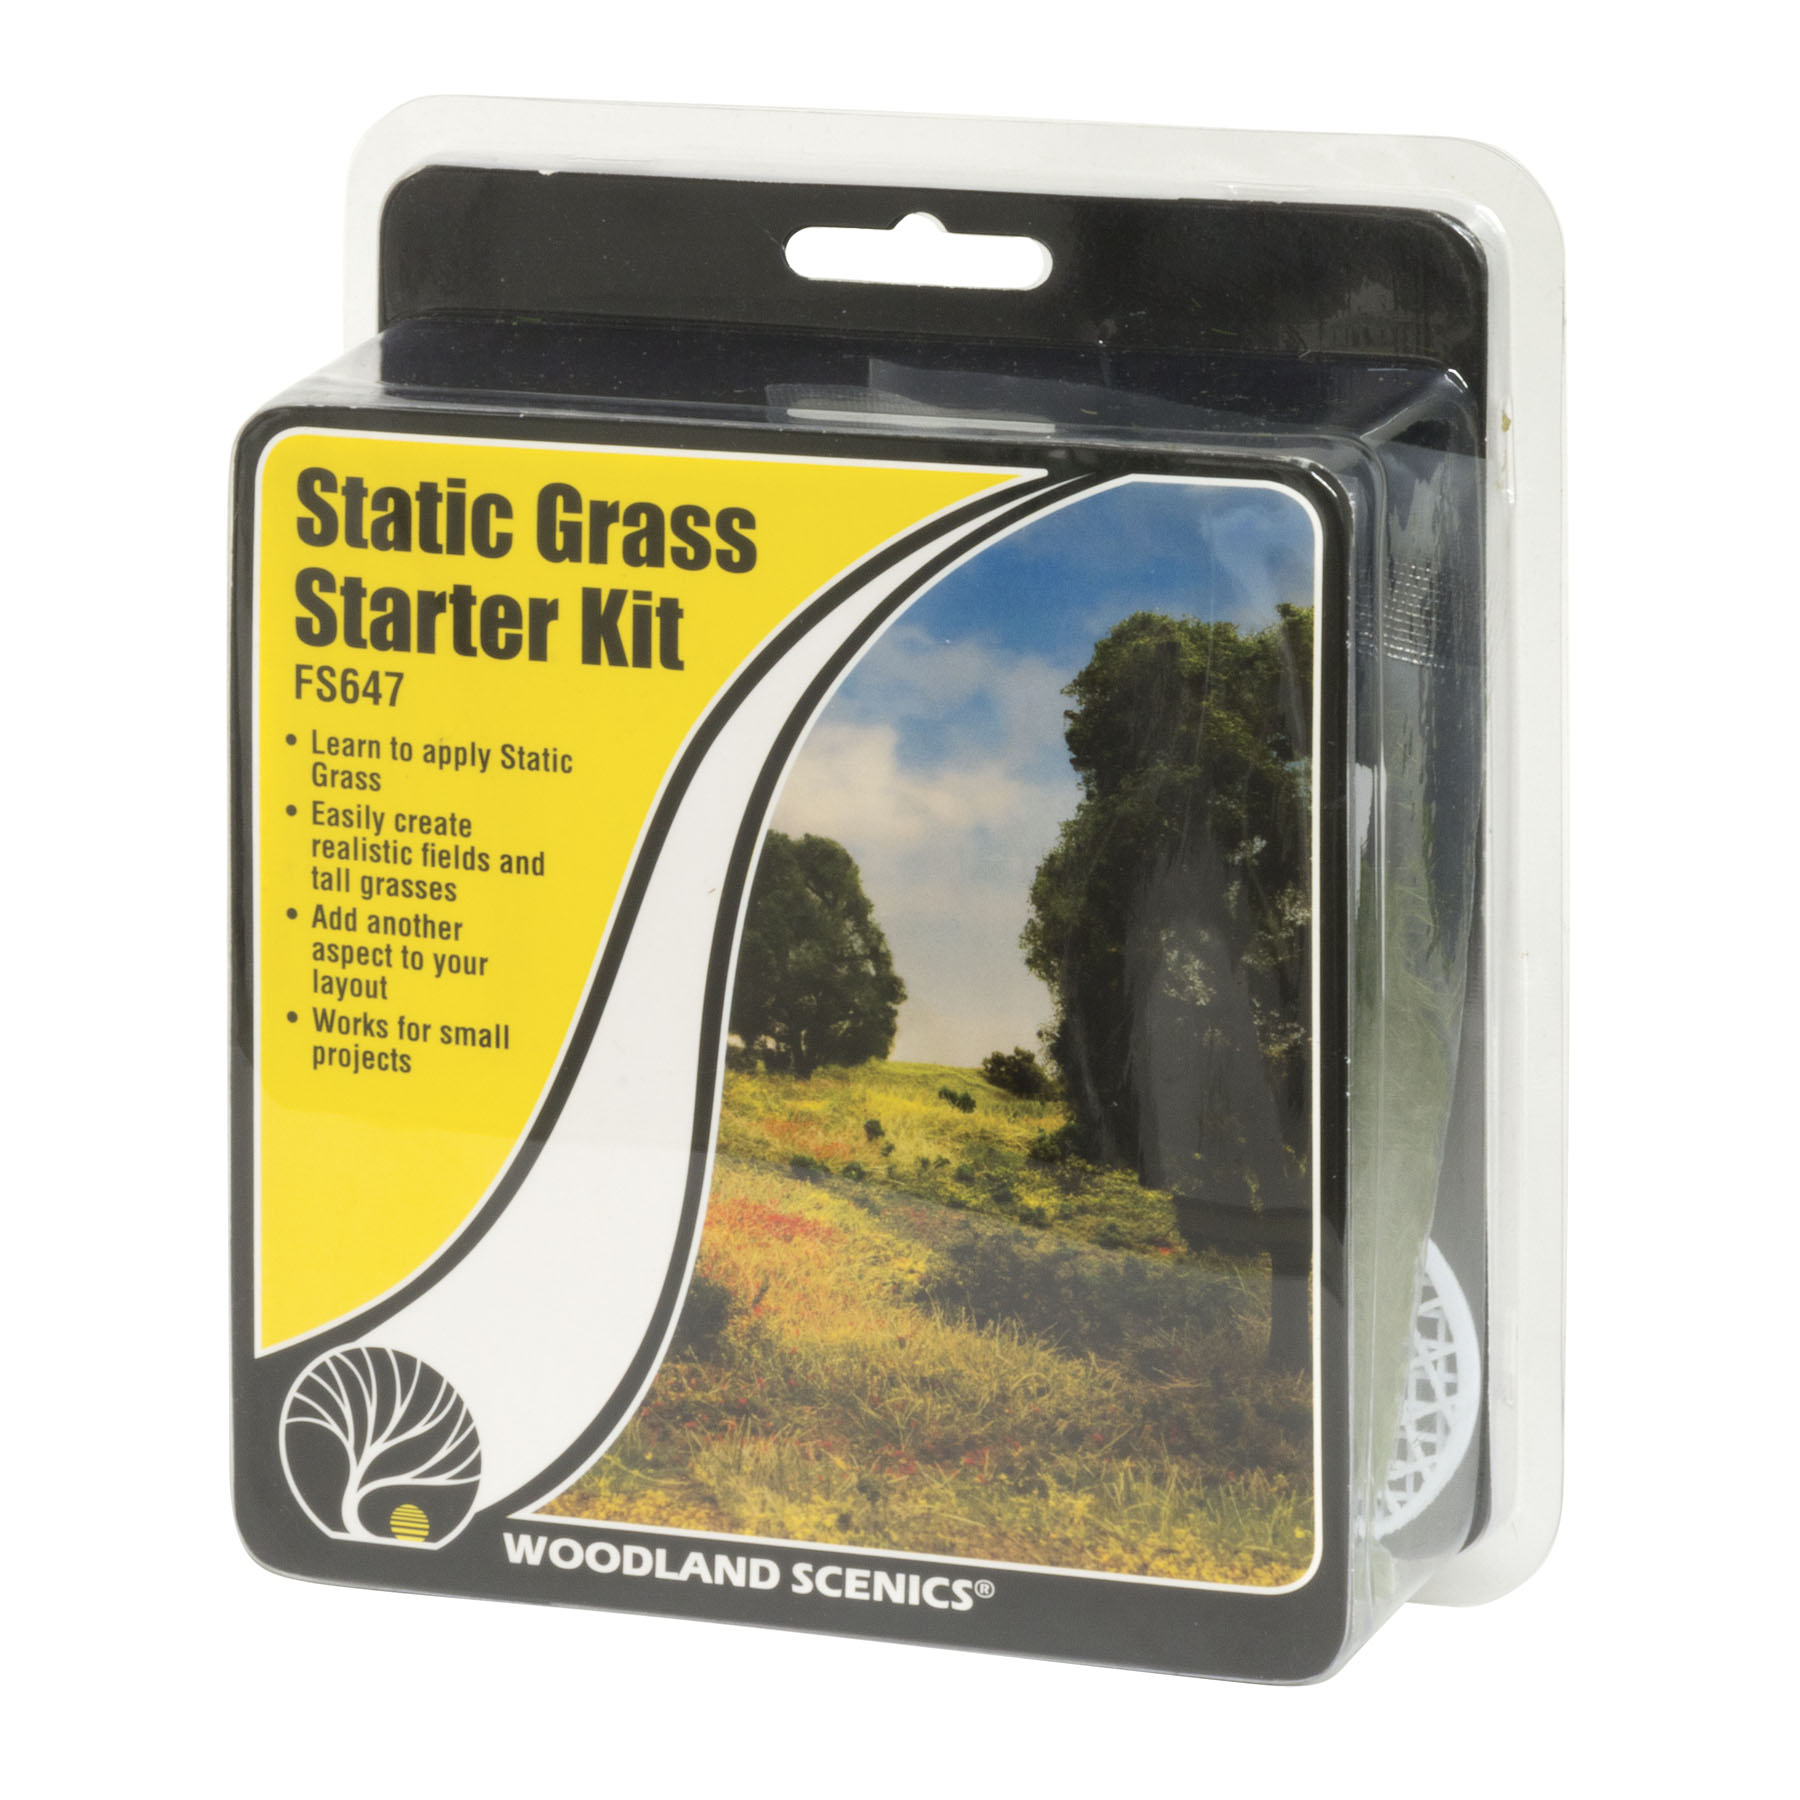 Details about Woodland Scenics Model Railroad Landscape Static Grass Field  System Starter Kit